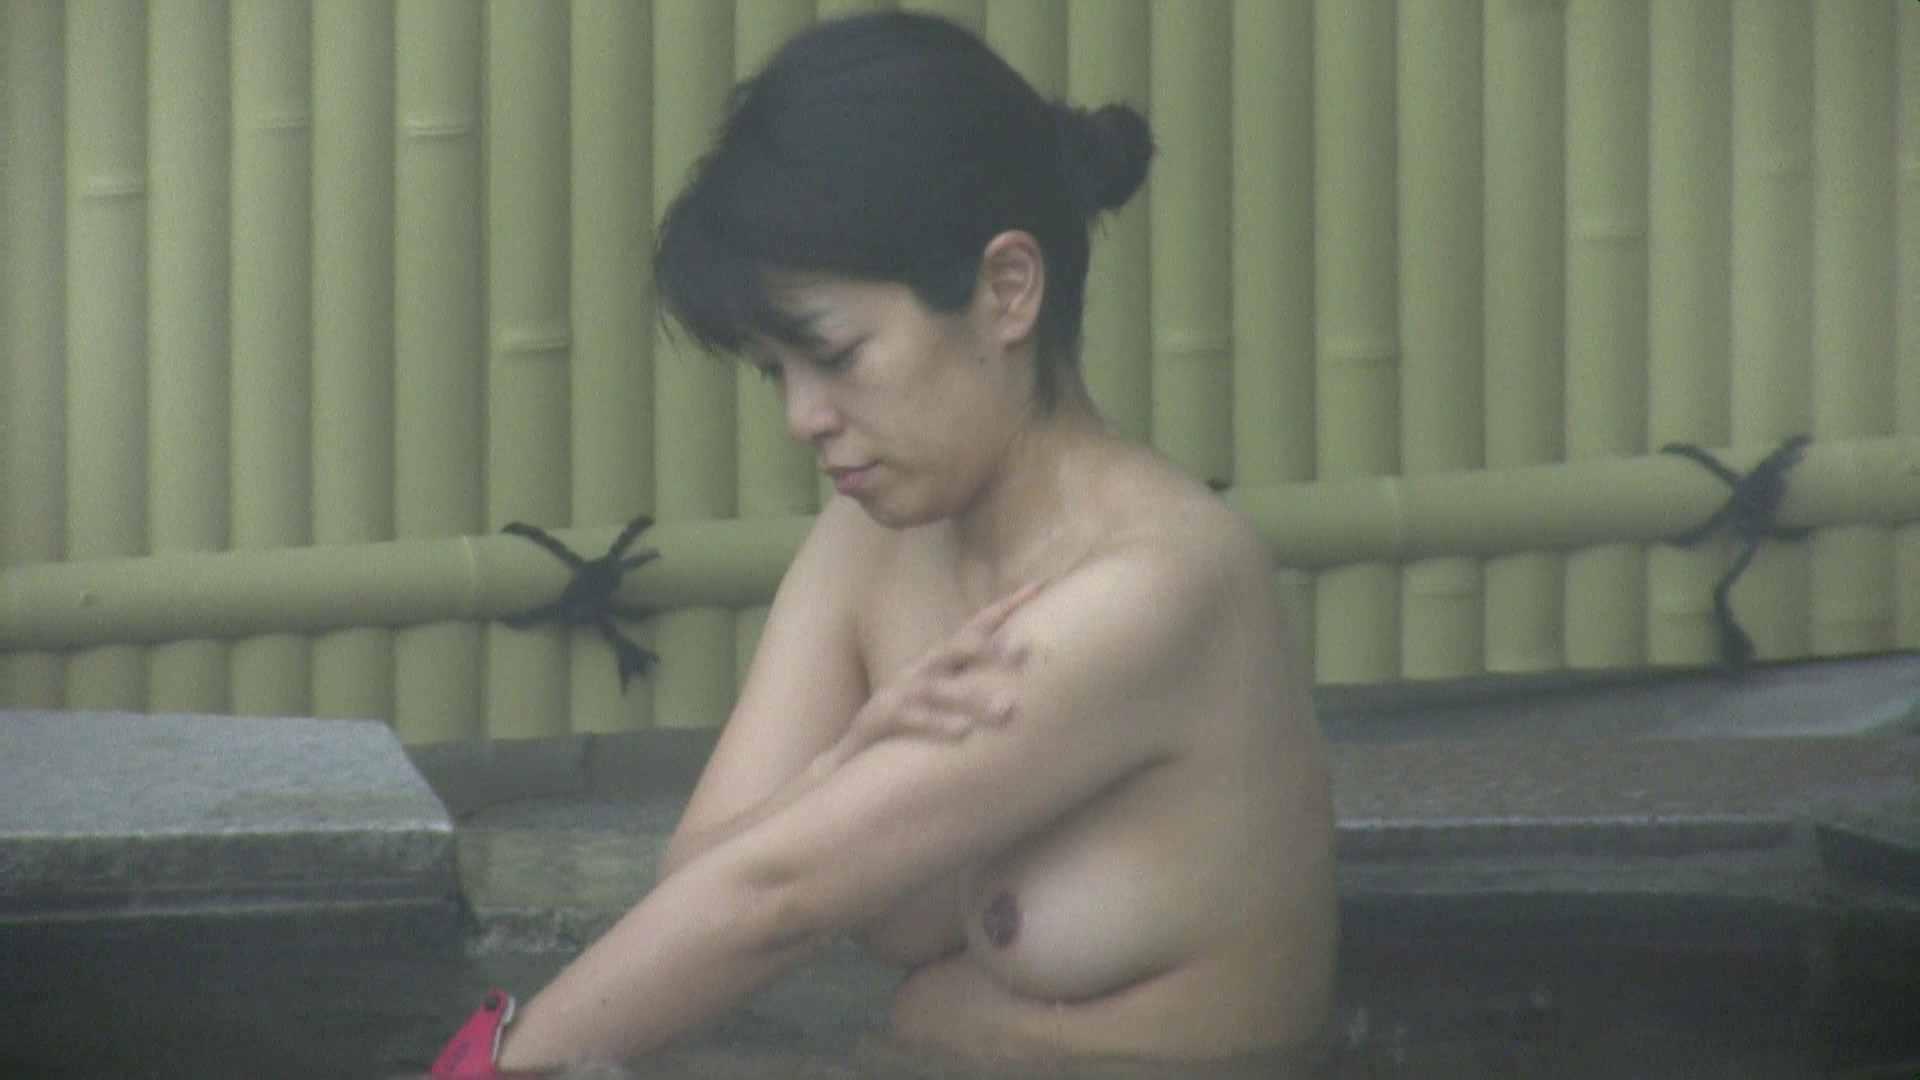 Aquaな露天風呂Vol.585 HなOL | 盗撮  93pic 47